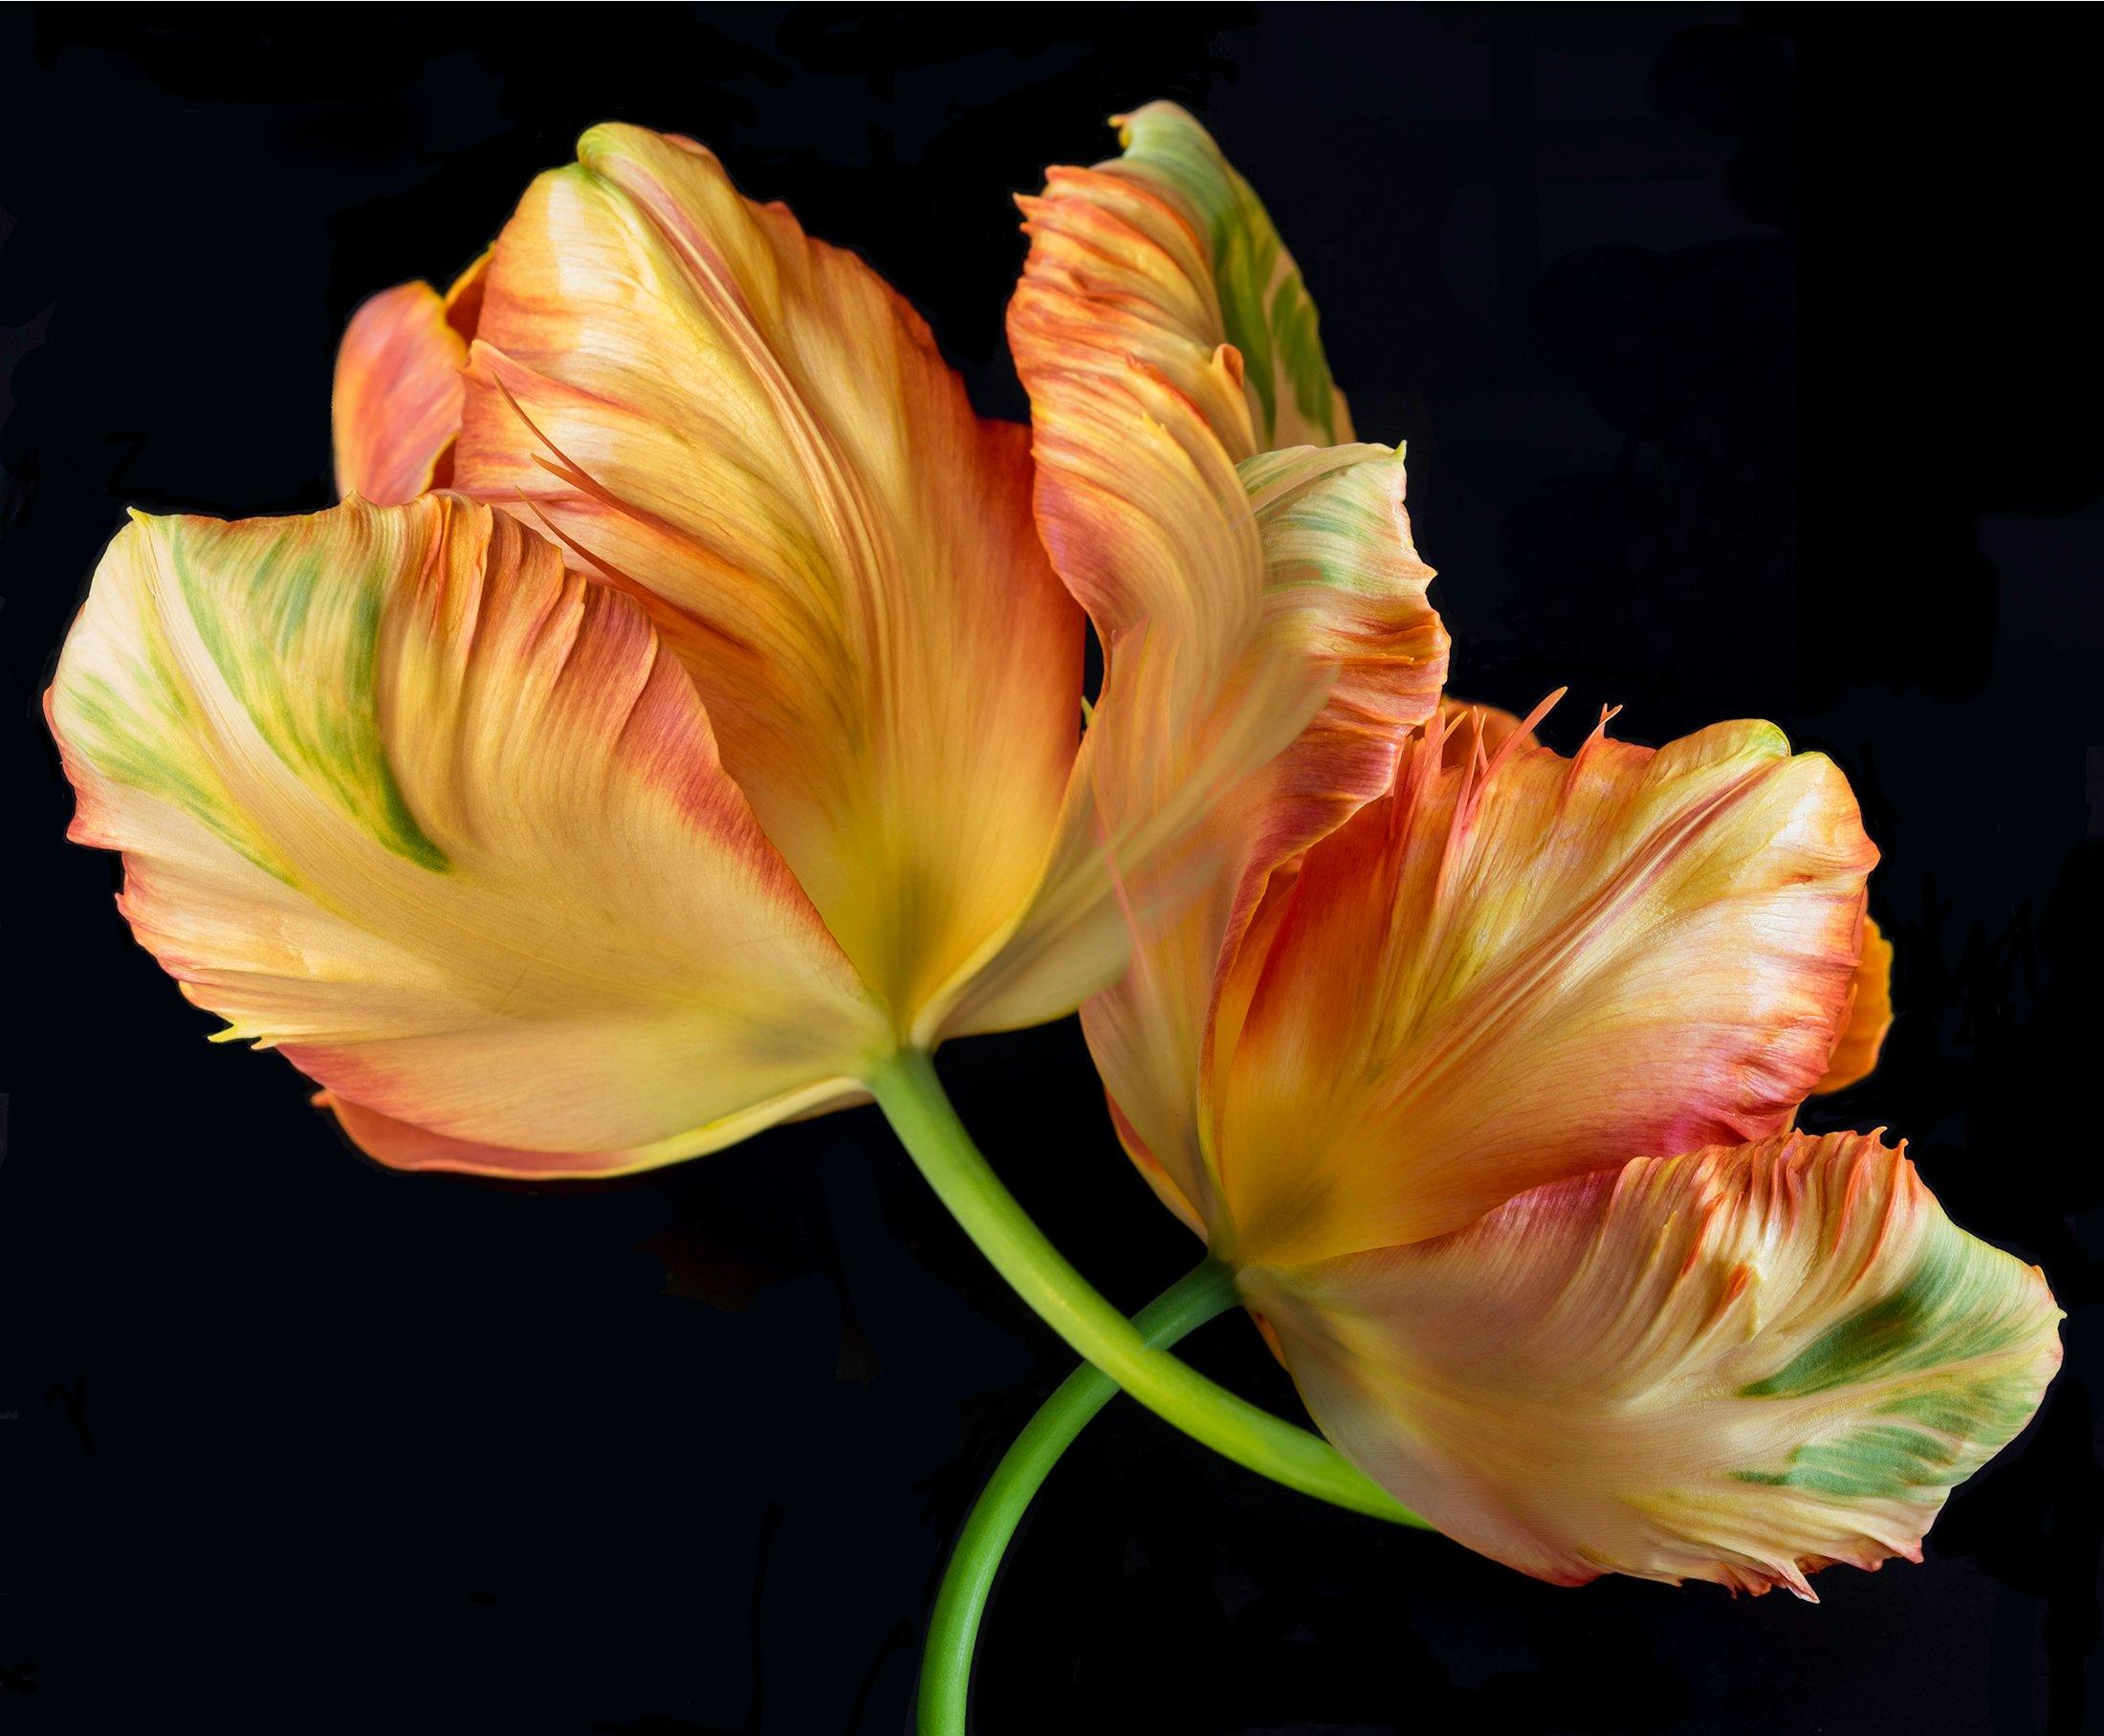 double-tulip-yellow-orange-black-background